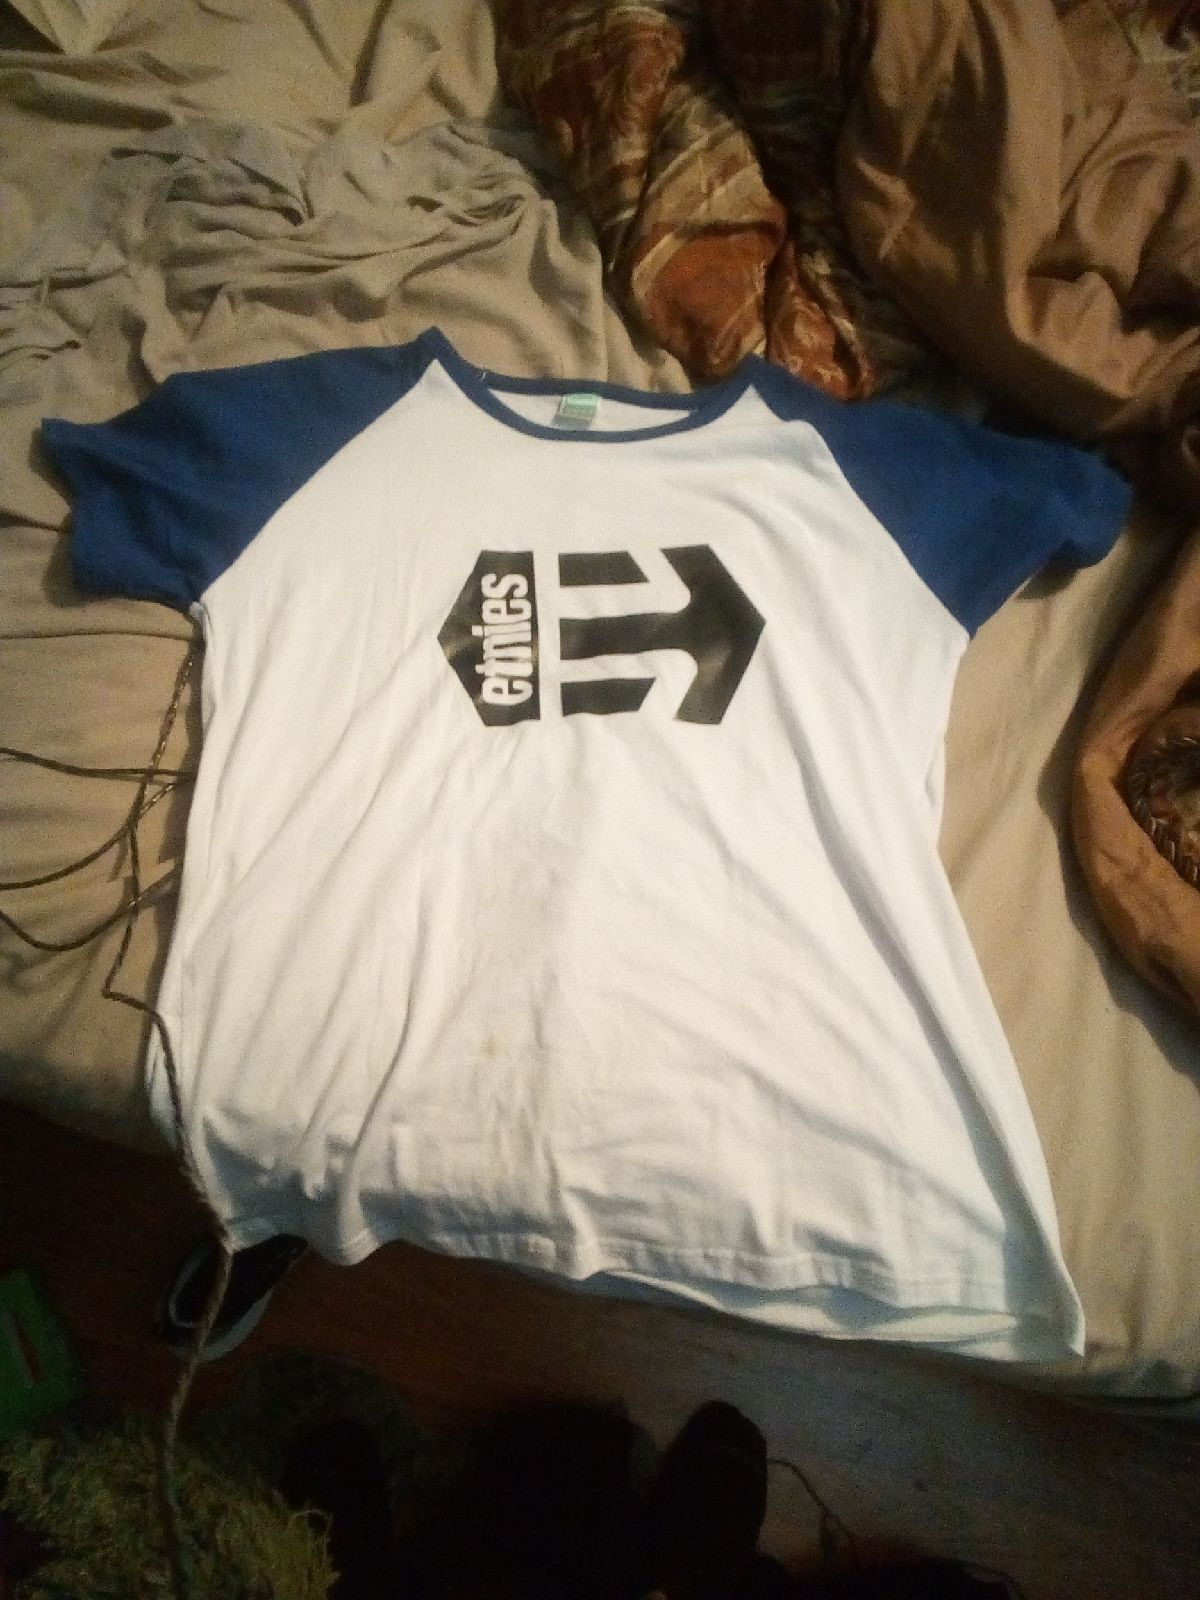 Men's Etnies shirt